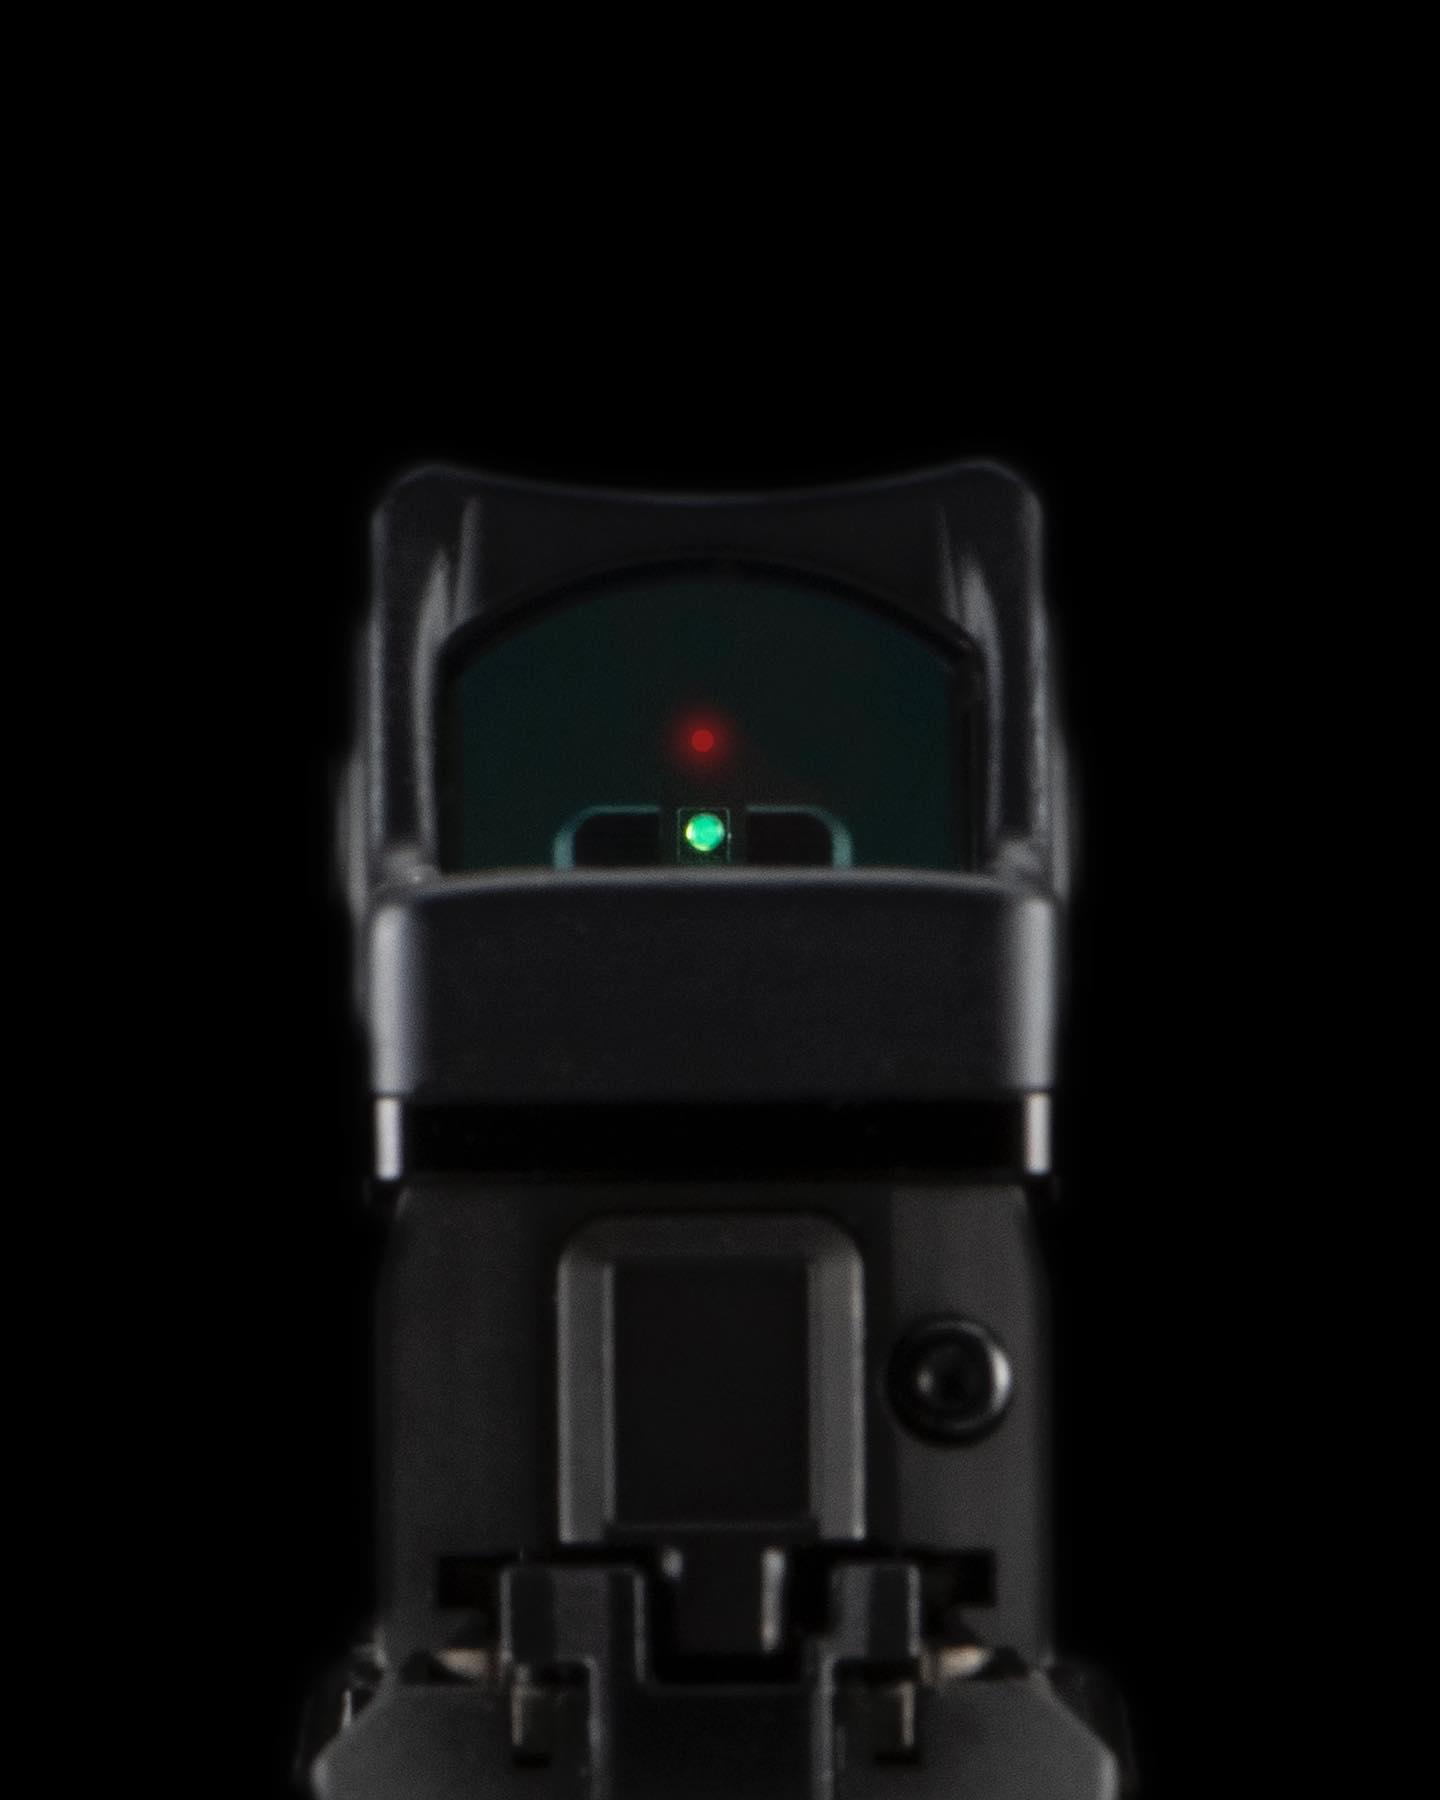 springer precision m17 x-compact x5 legion cowtiness sig sauer trijicon rmr holosun 507c